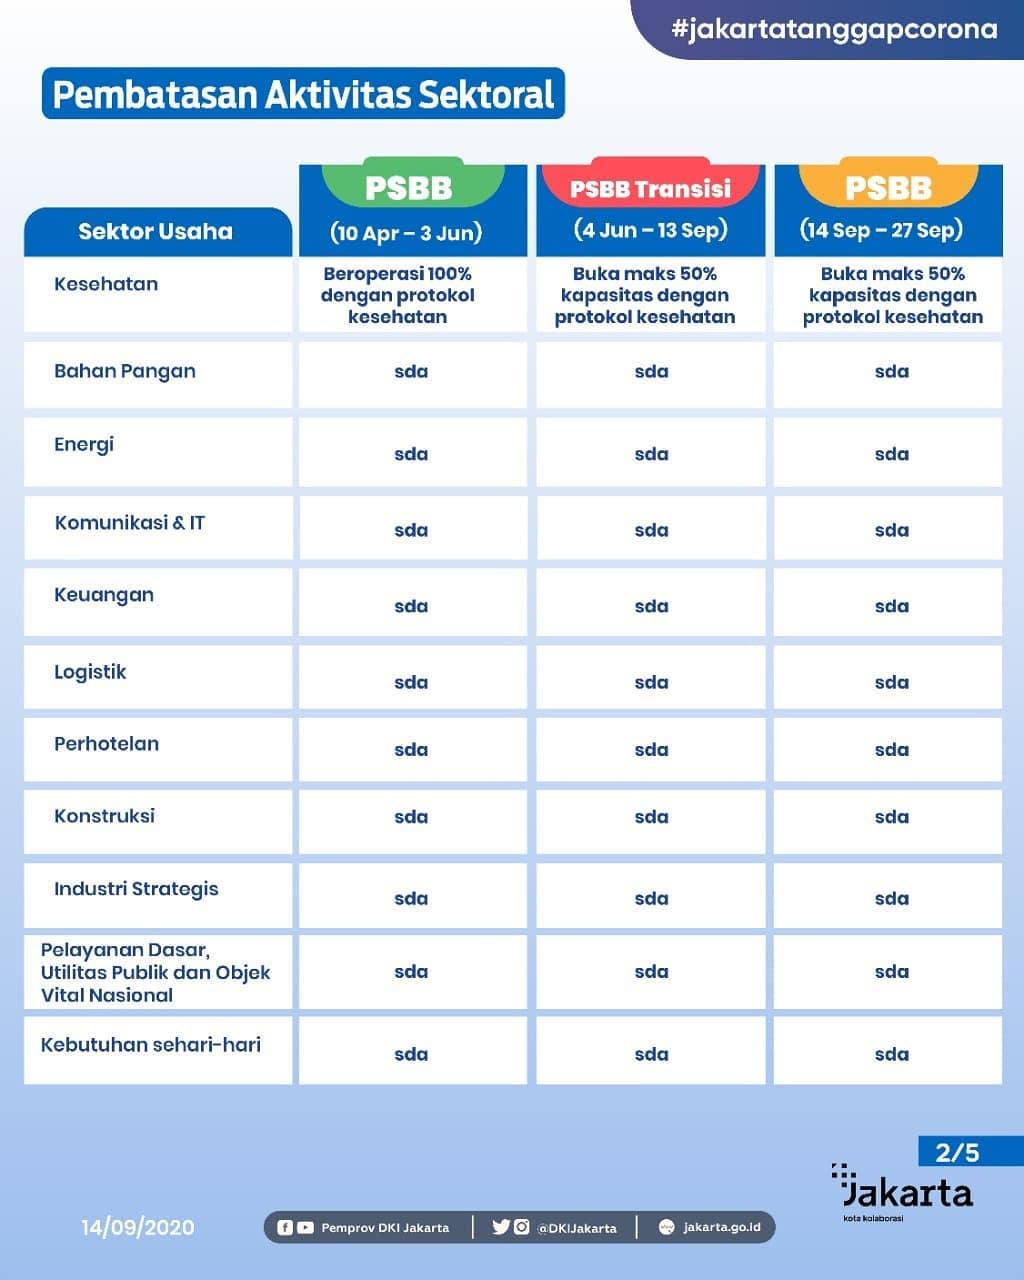 Point Penting Regulasi PSBB Provinsi DKI Jakarta-Slide_2